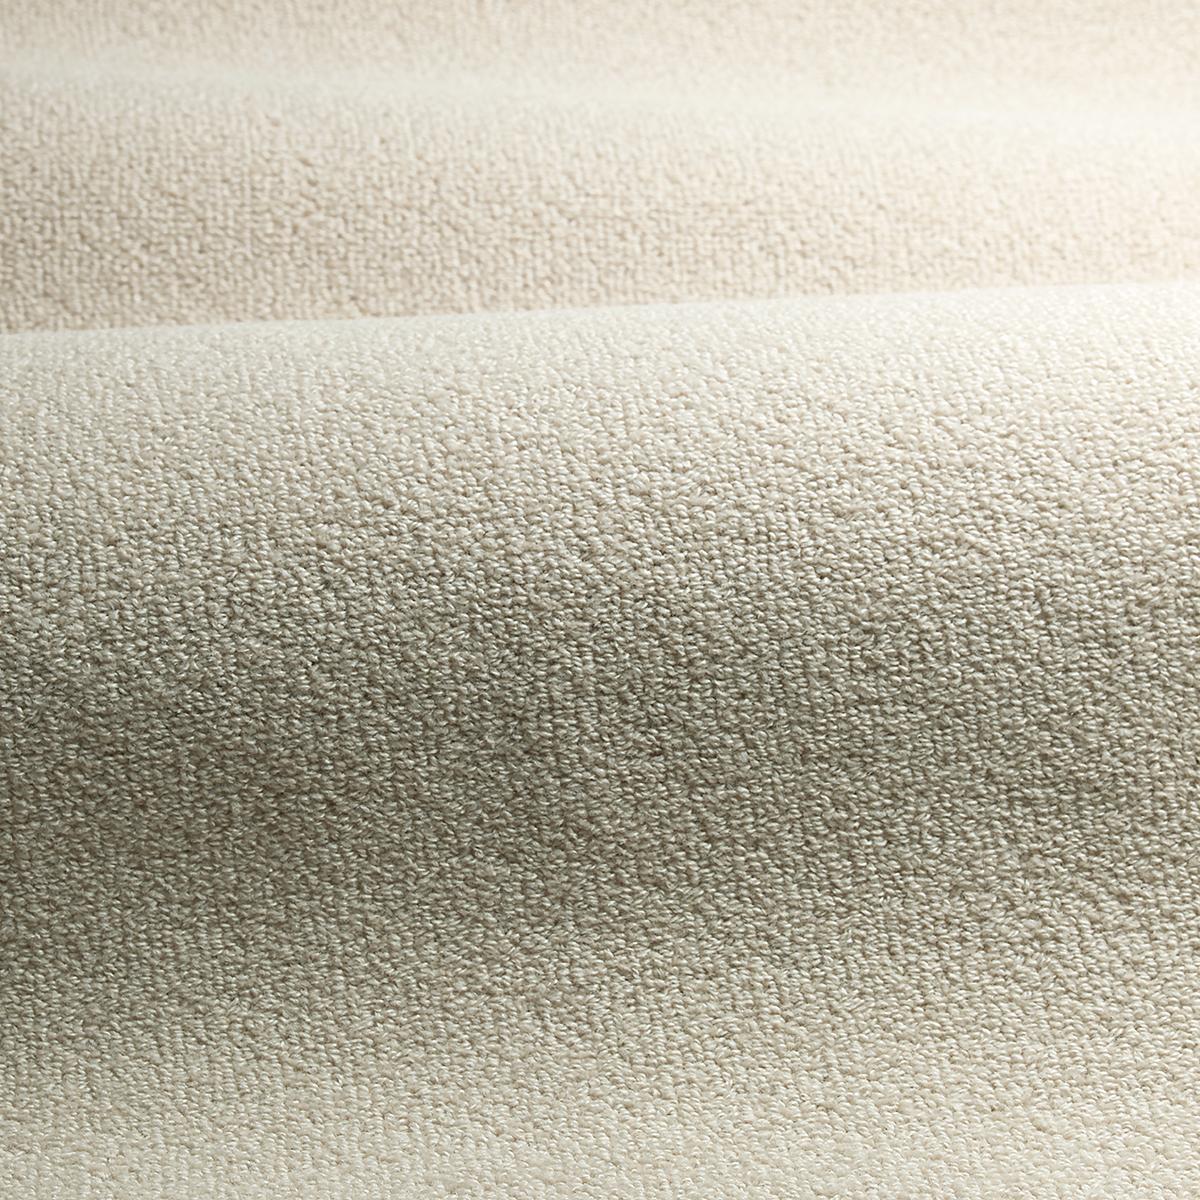 Muslin J Mish Mills Wool Carpet Rugs